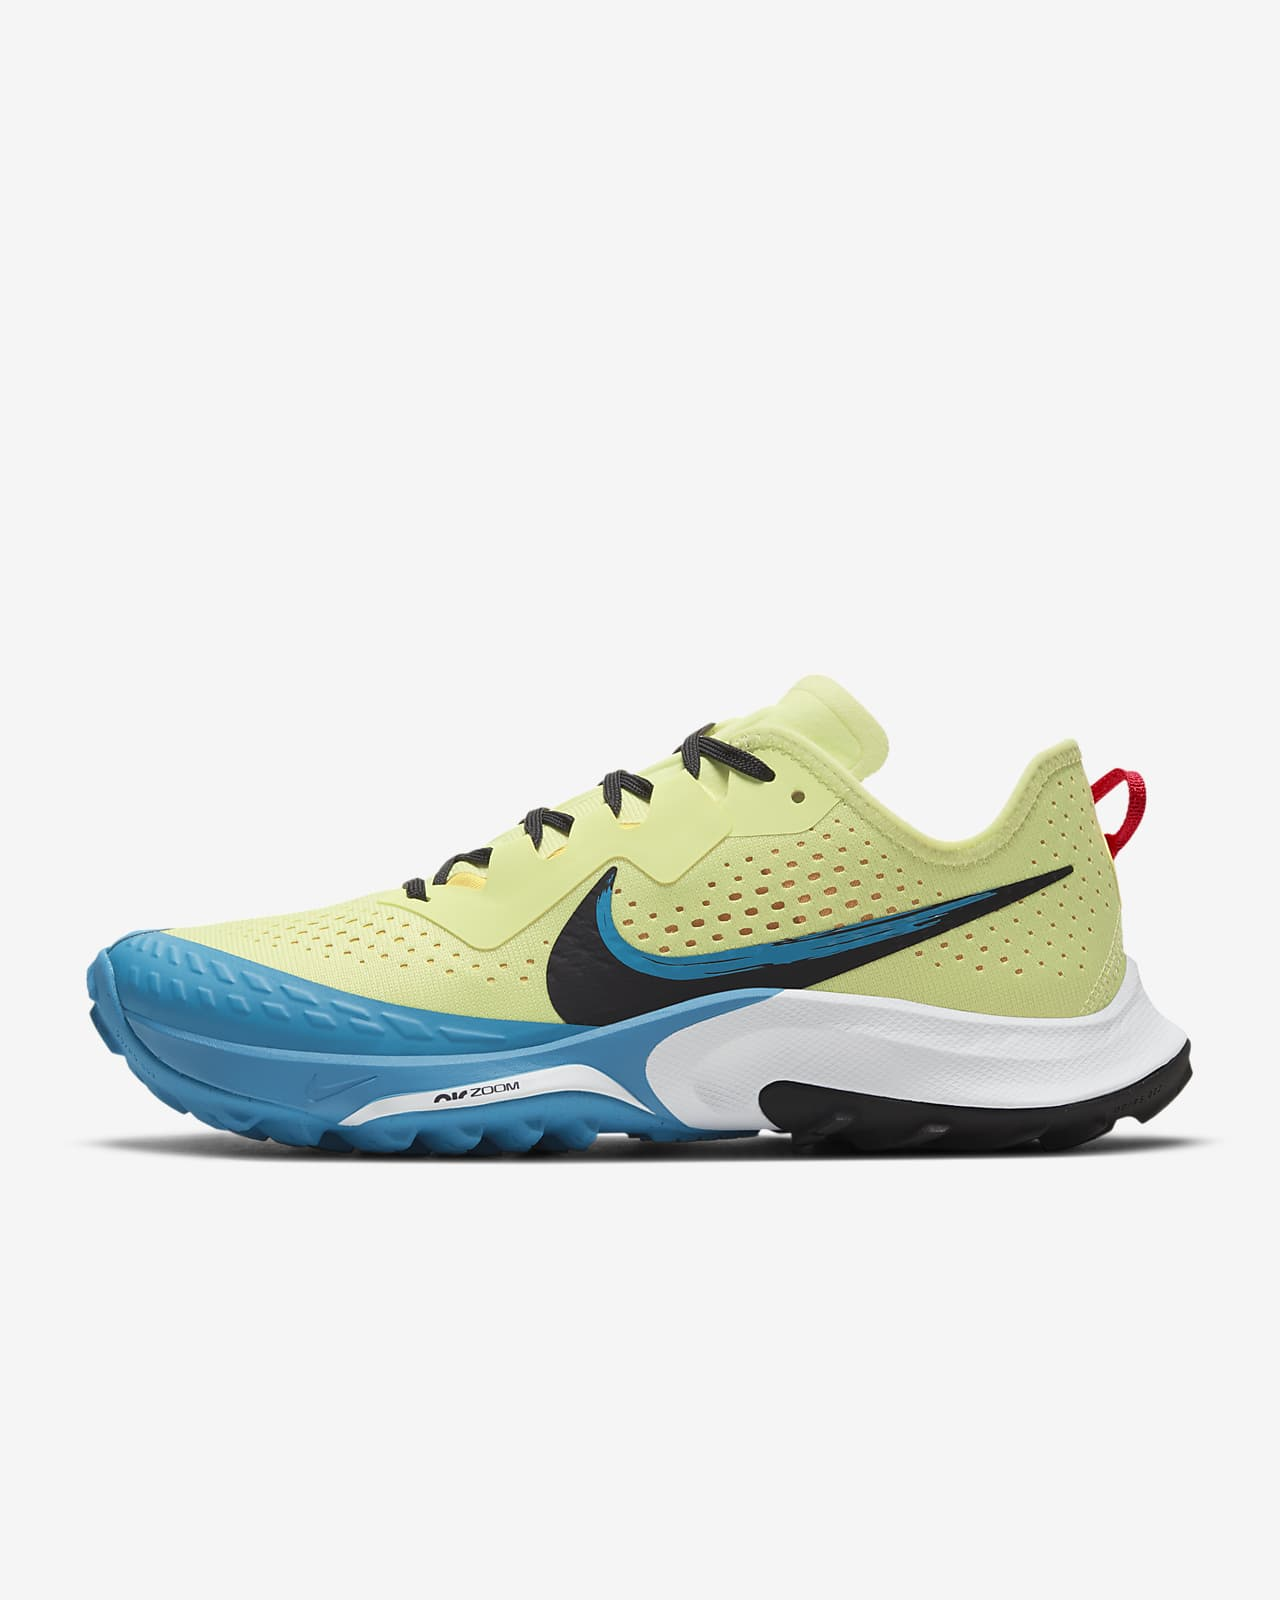 Chaussure de running sur sentier Nike Air Zoom Terra Kiger 7 pour Femme